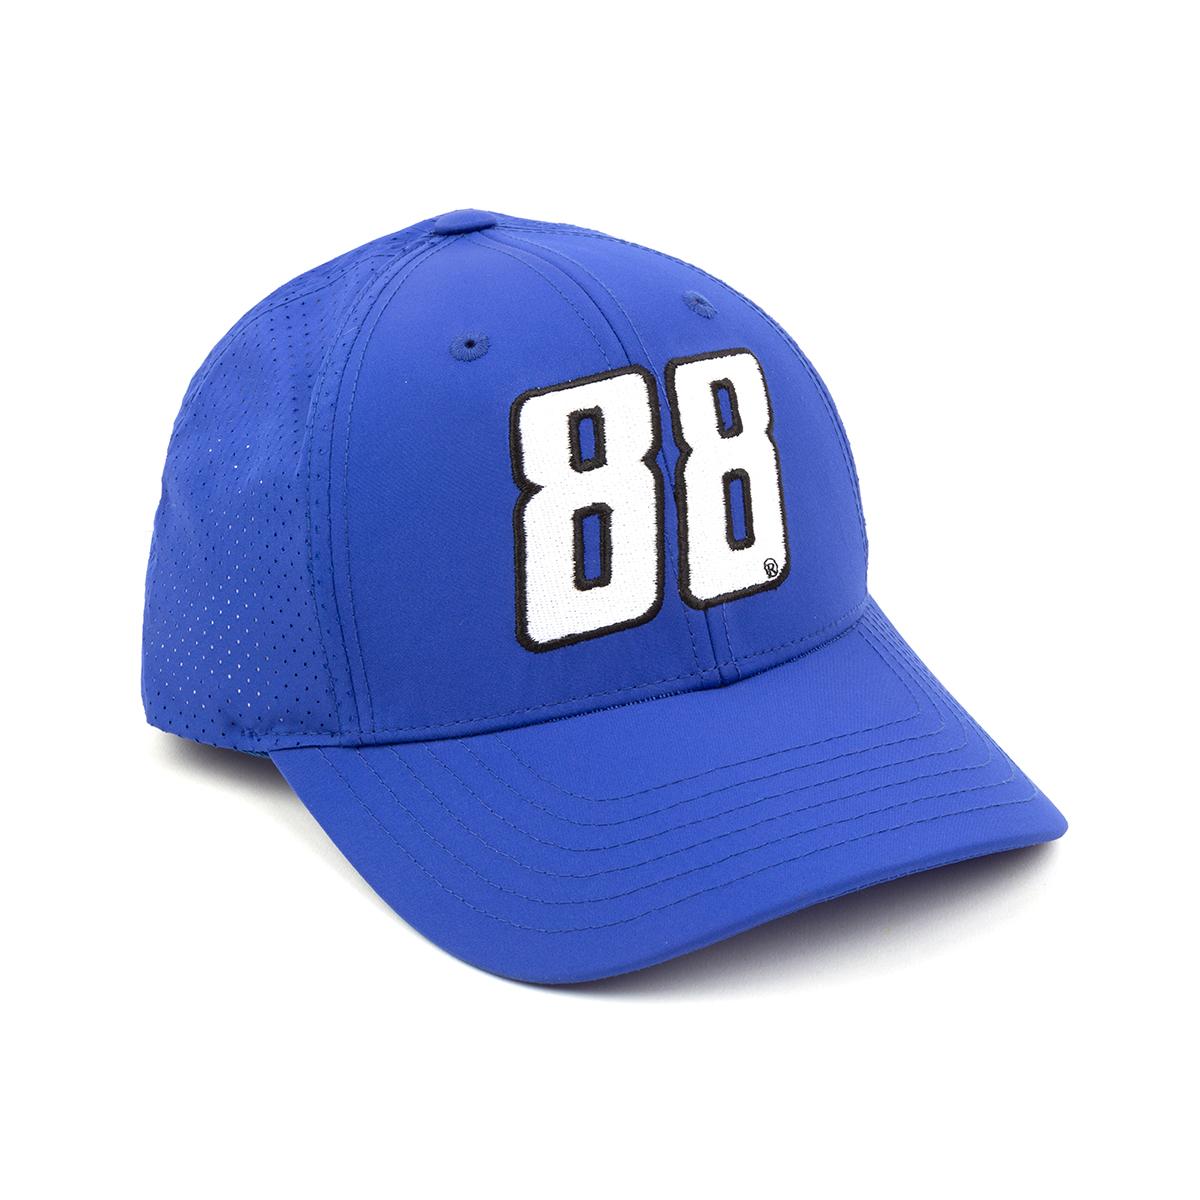 Alex Bowman #88 2019 NASCAR Royal Number Hat